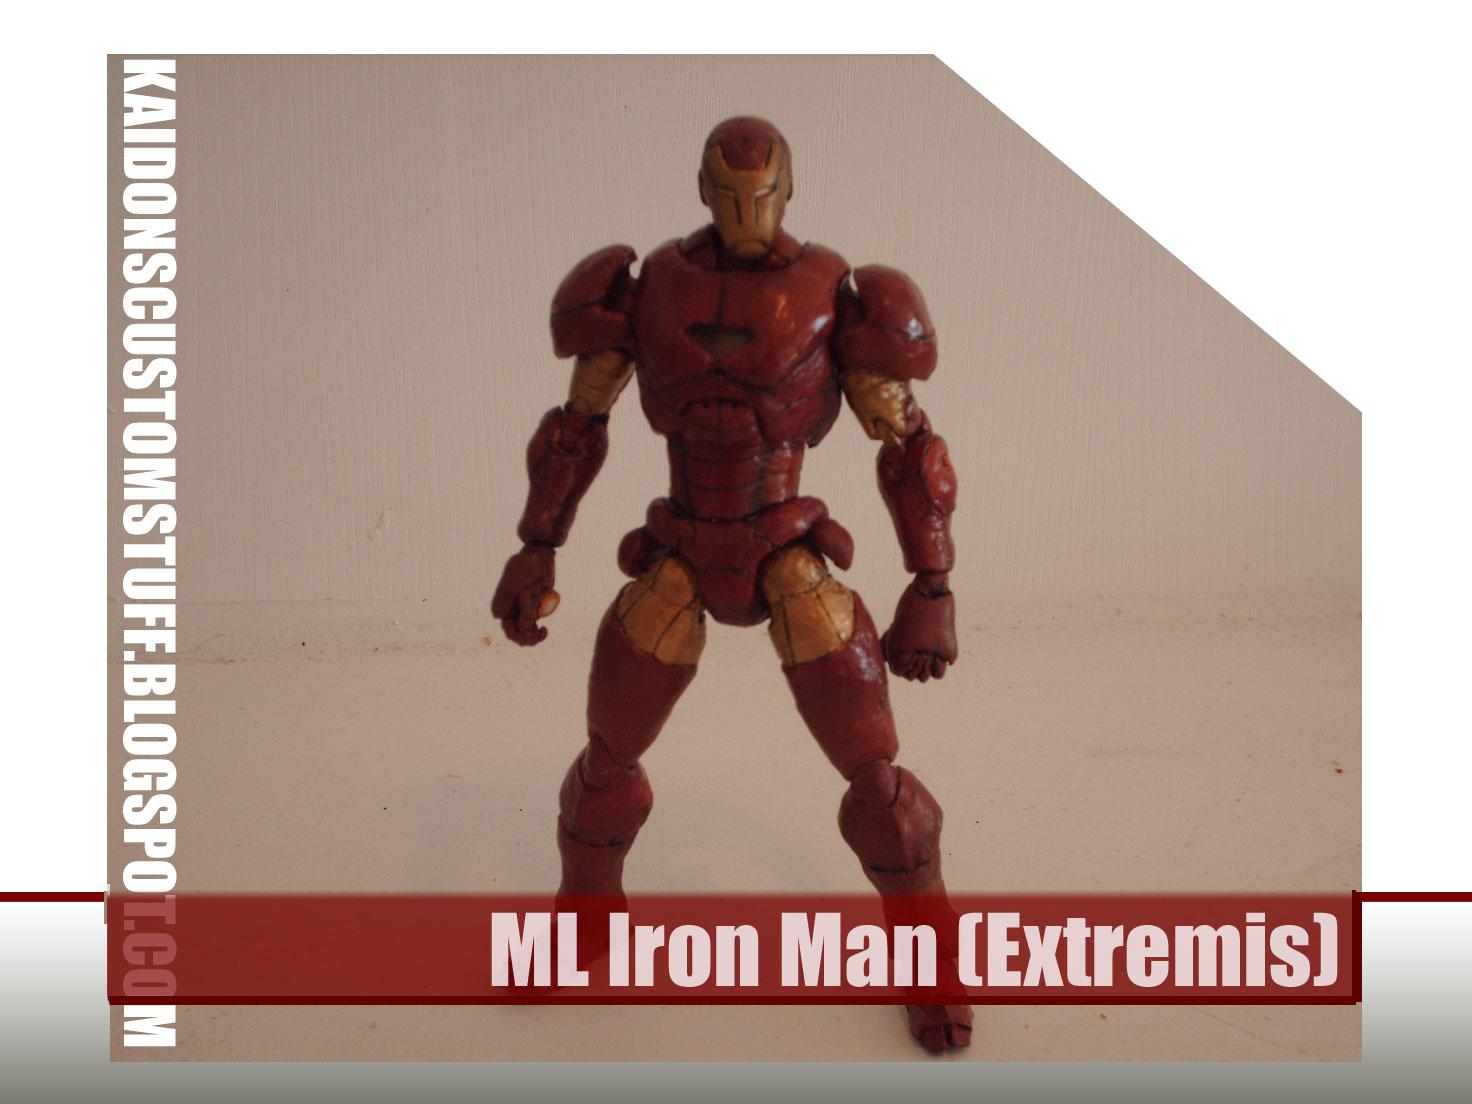 http://1.bp.blogspot.com/_NydzcGVJtdA/TObifa01WbI/AAAAAAAAATg/dVfV3I5GbmA/s1600/ML-Iron-Man-Extremis-04.jpg